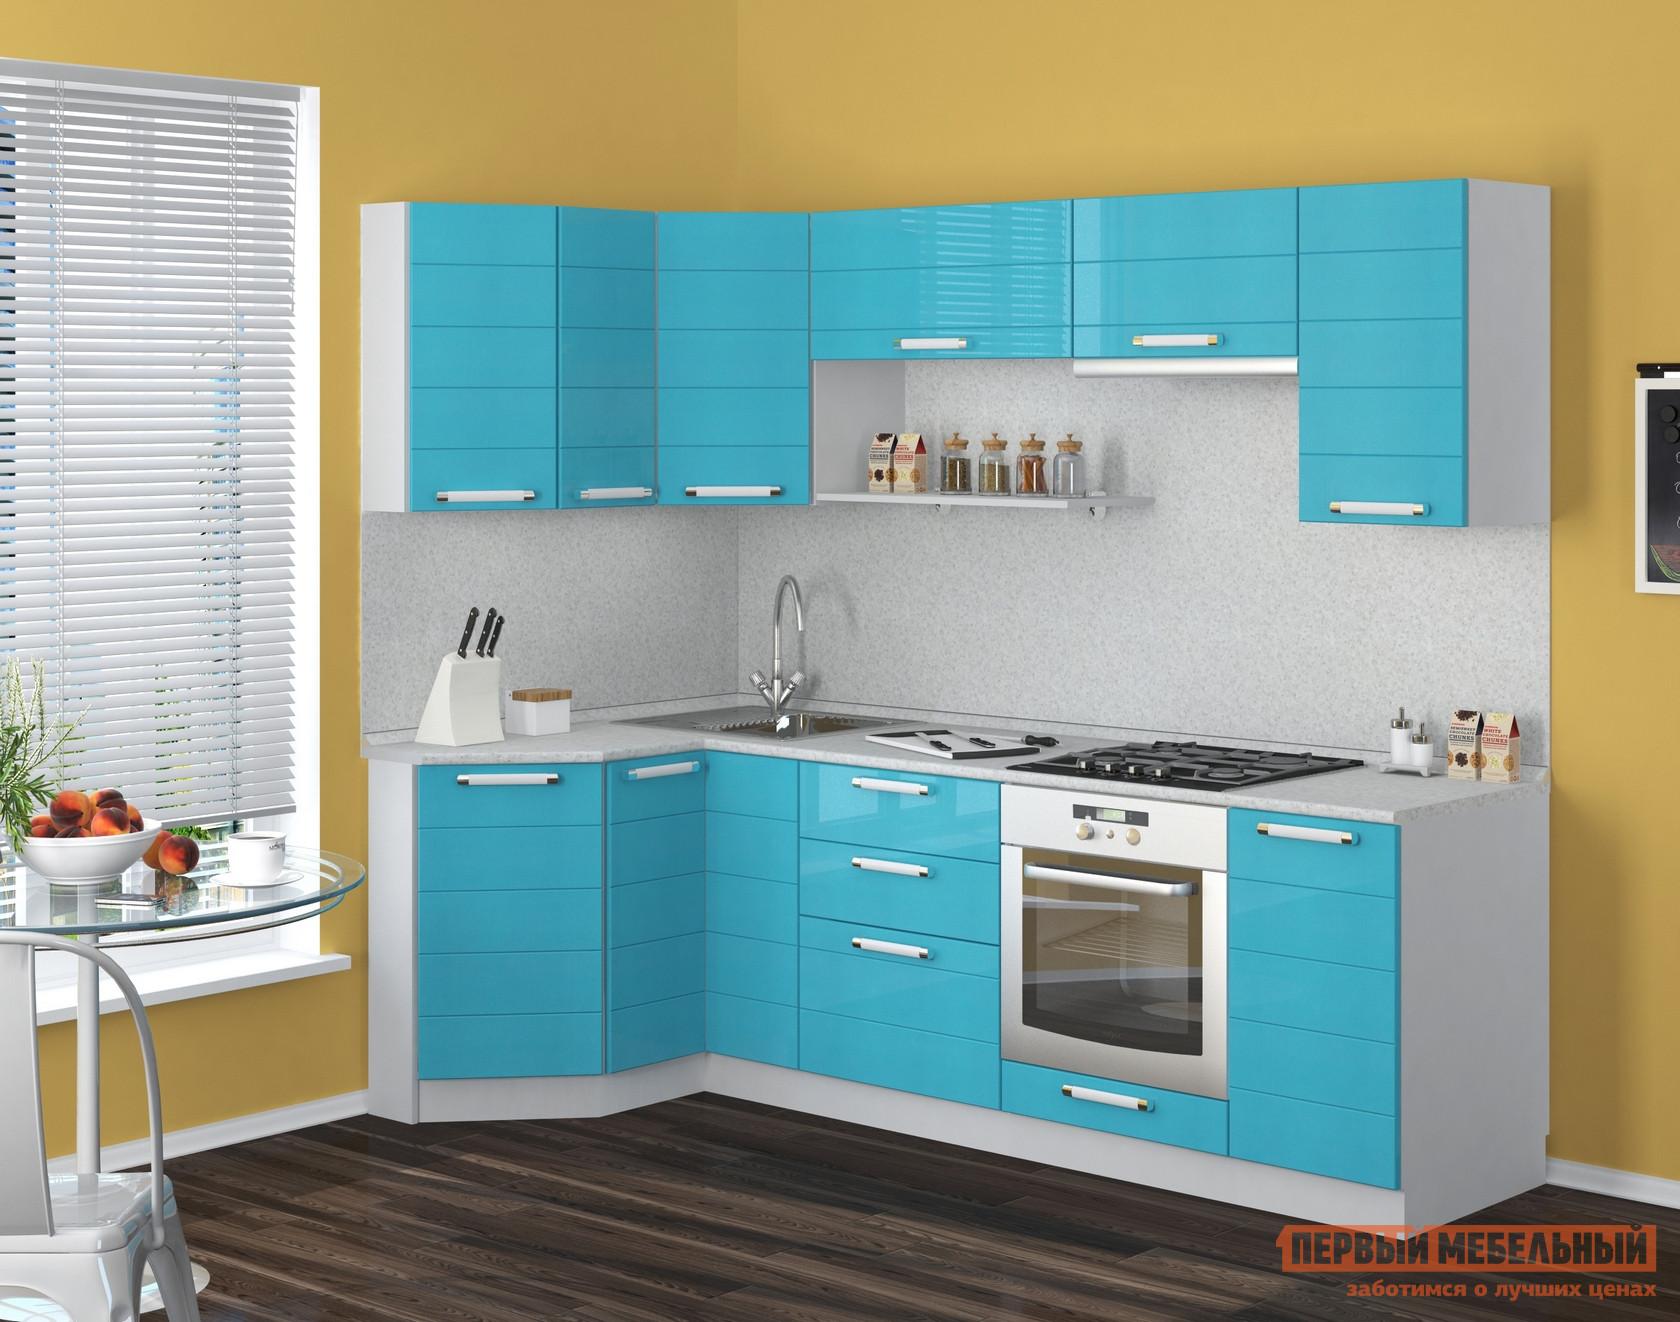 Кухонный гарнитур угловой Боровичи Престиж угловой 1200х1785 мм кухонный гарнитур престиж 2